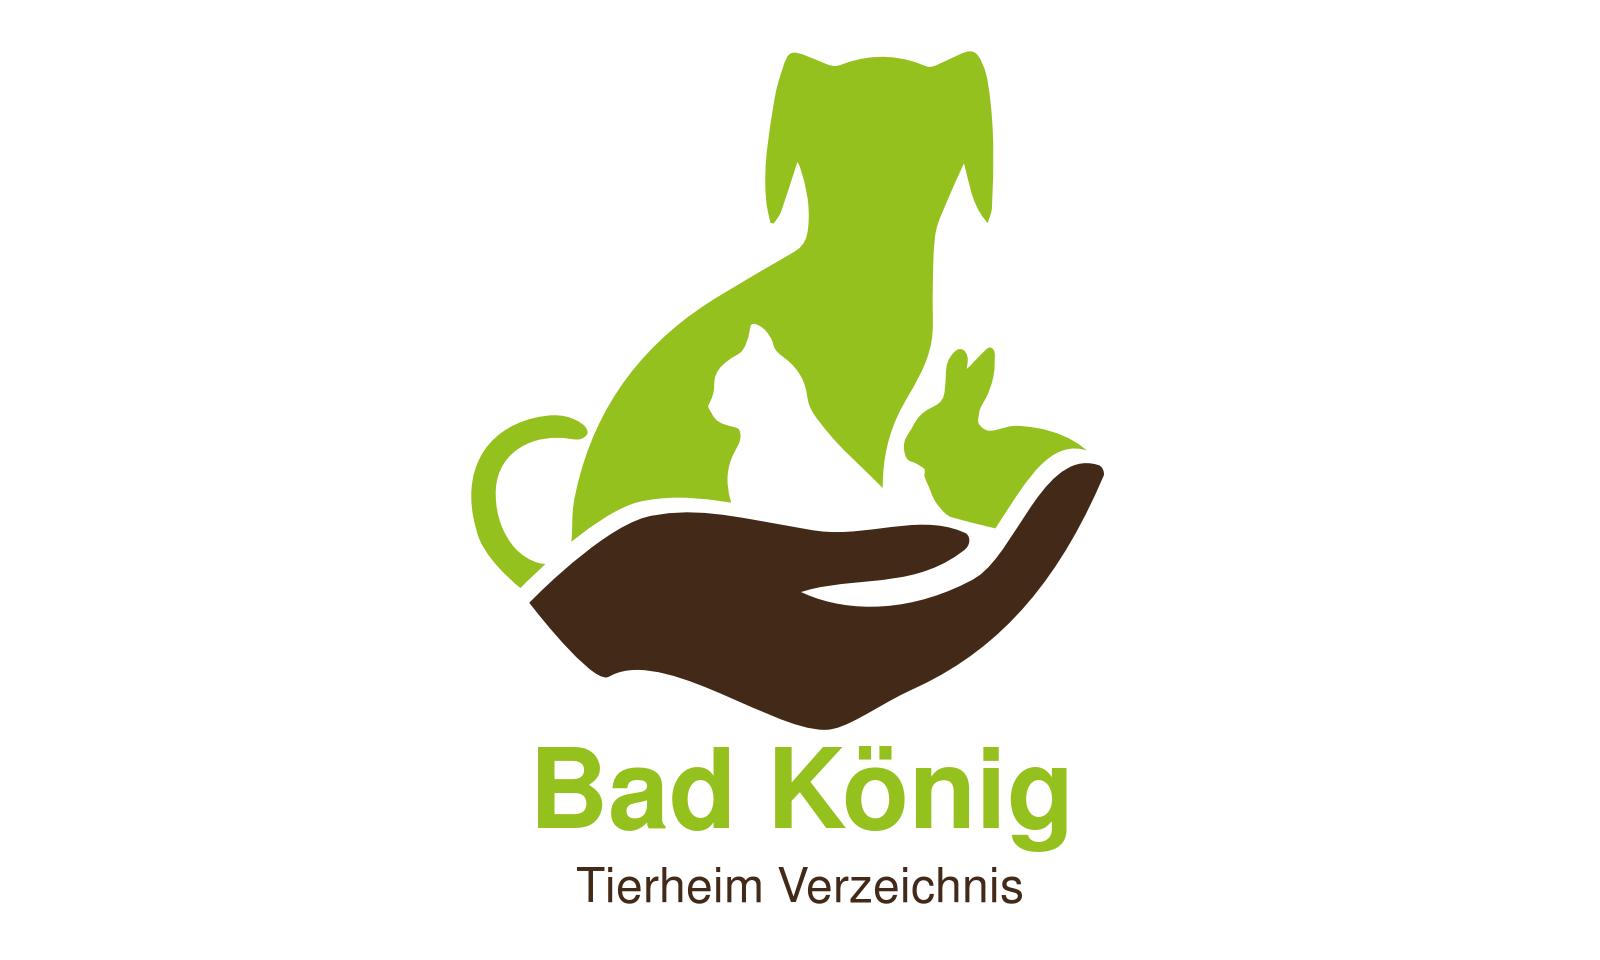 Tierheim Bad König